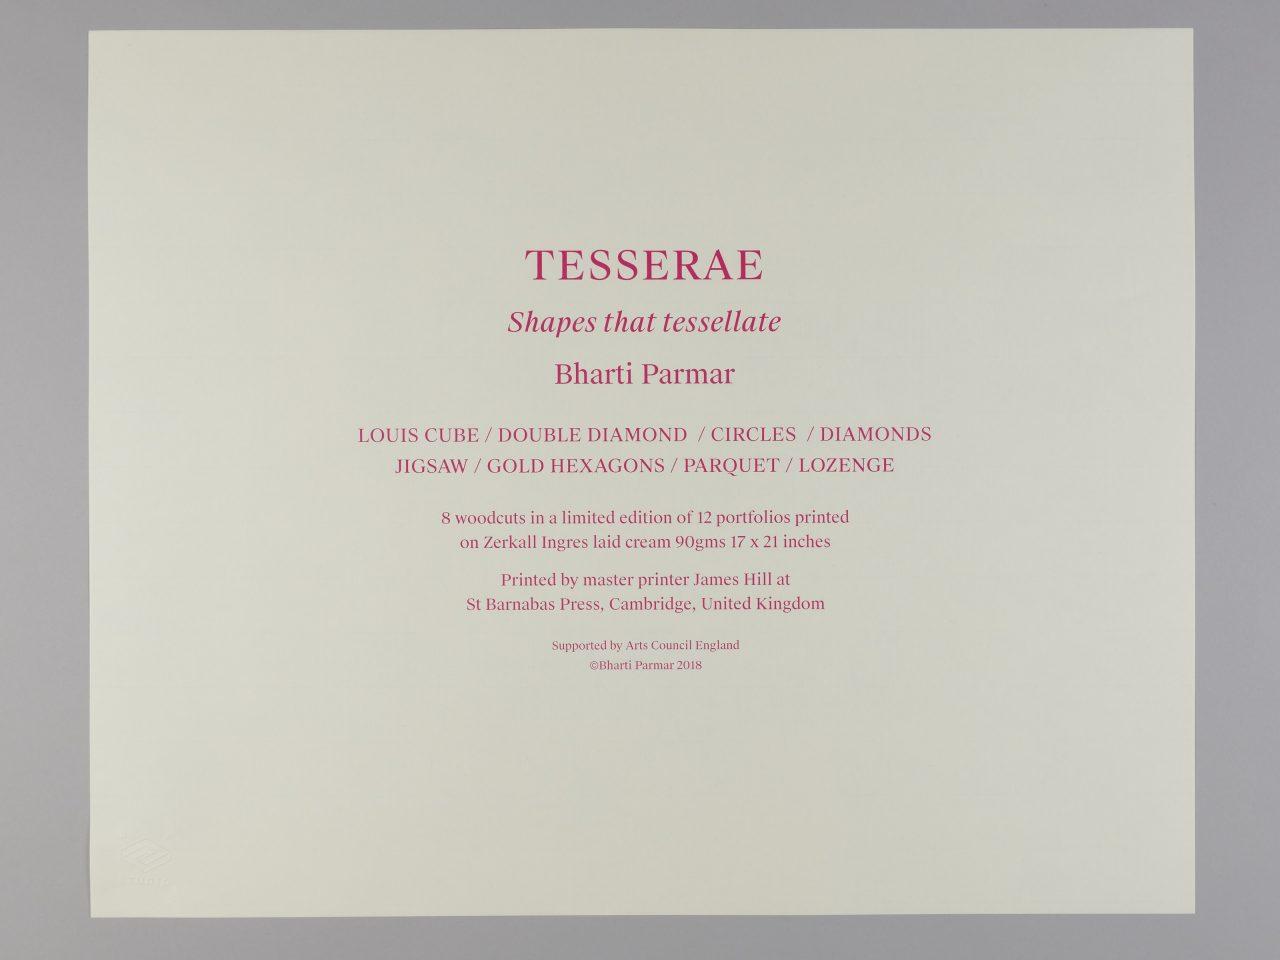 Tesserae-colophon-legible